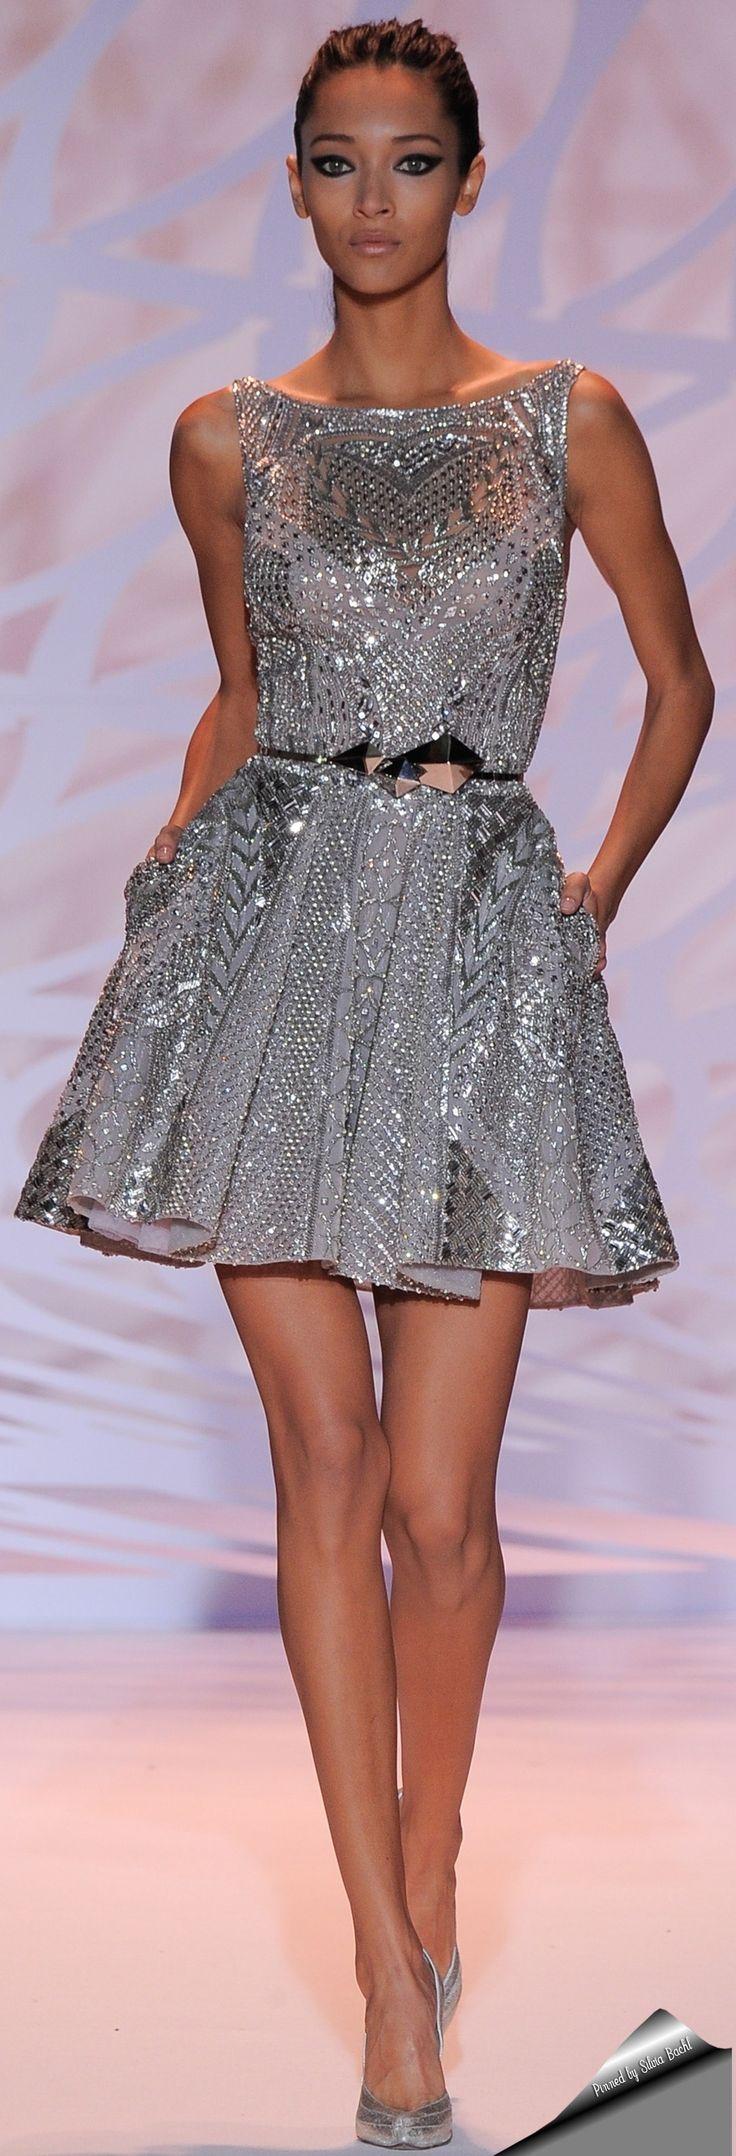 Zuhair Murad Haute Couture Fall 2014.